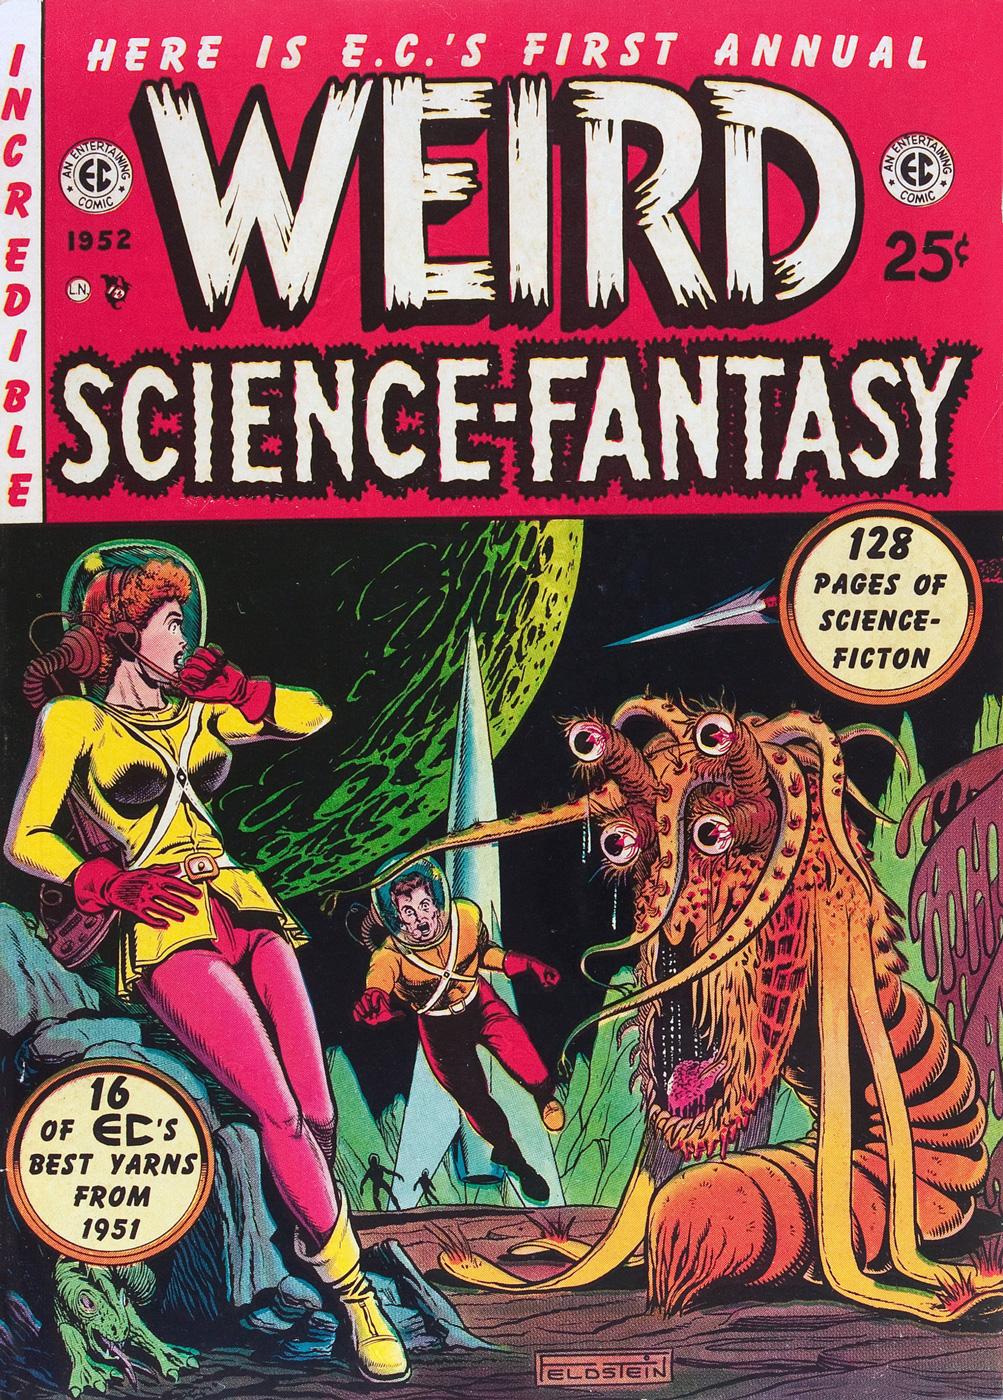 WeirdScienceFantasyAnnual#1